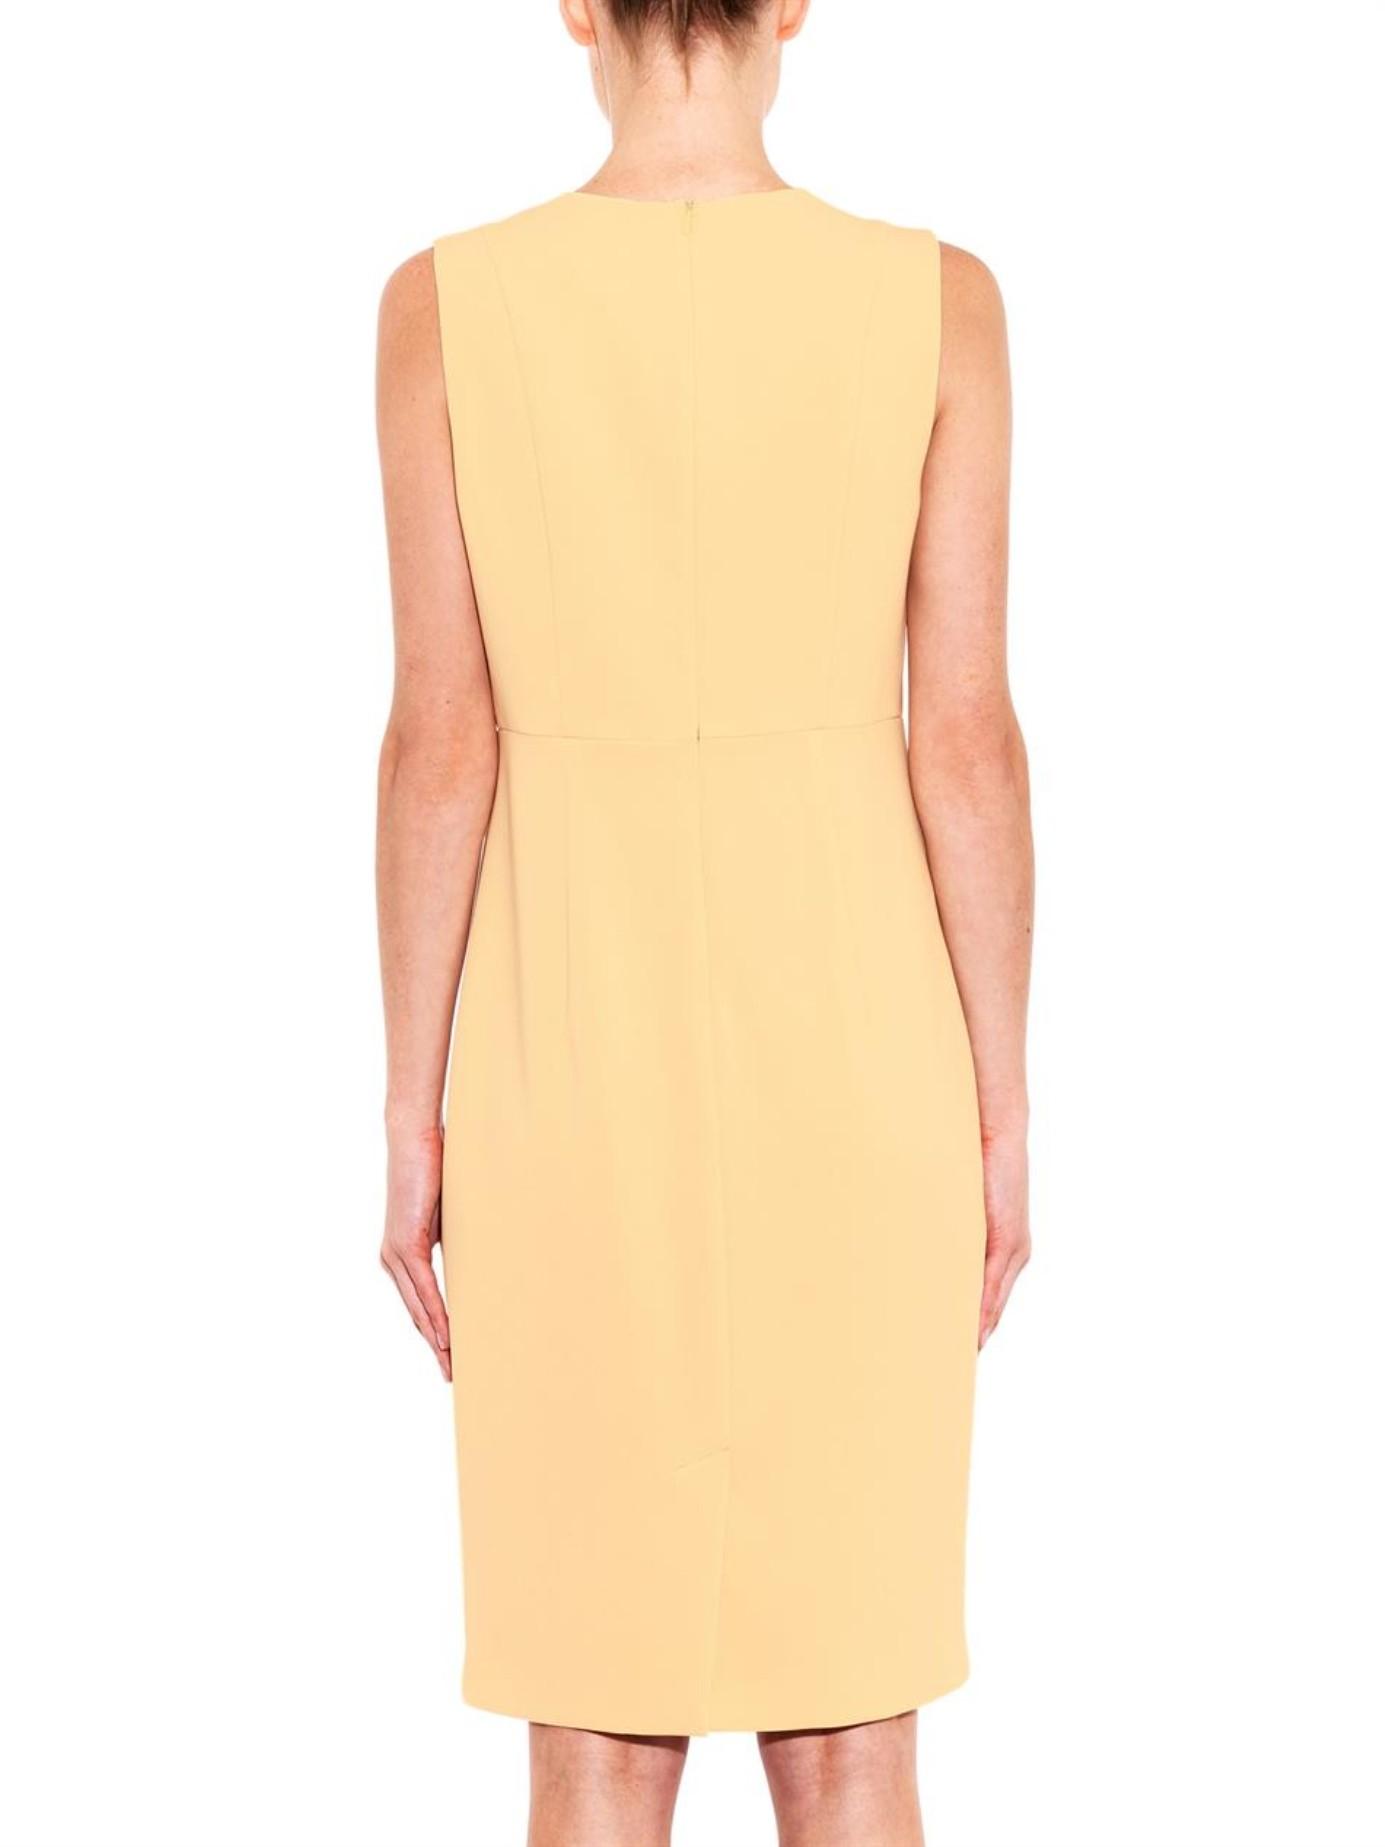 max mara studio danae dress in yellow lyst. Black Bedroom Furniture Sets. Home Design Ideas